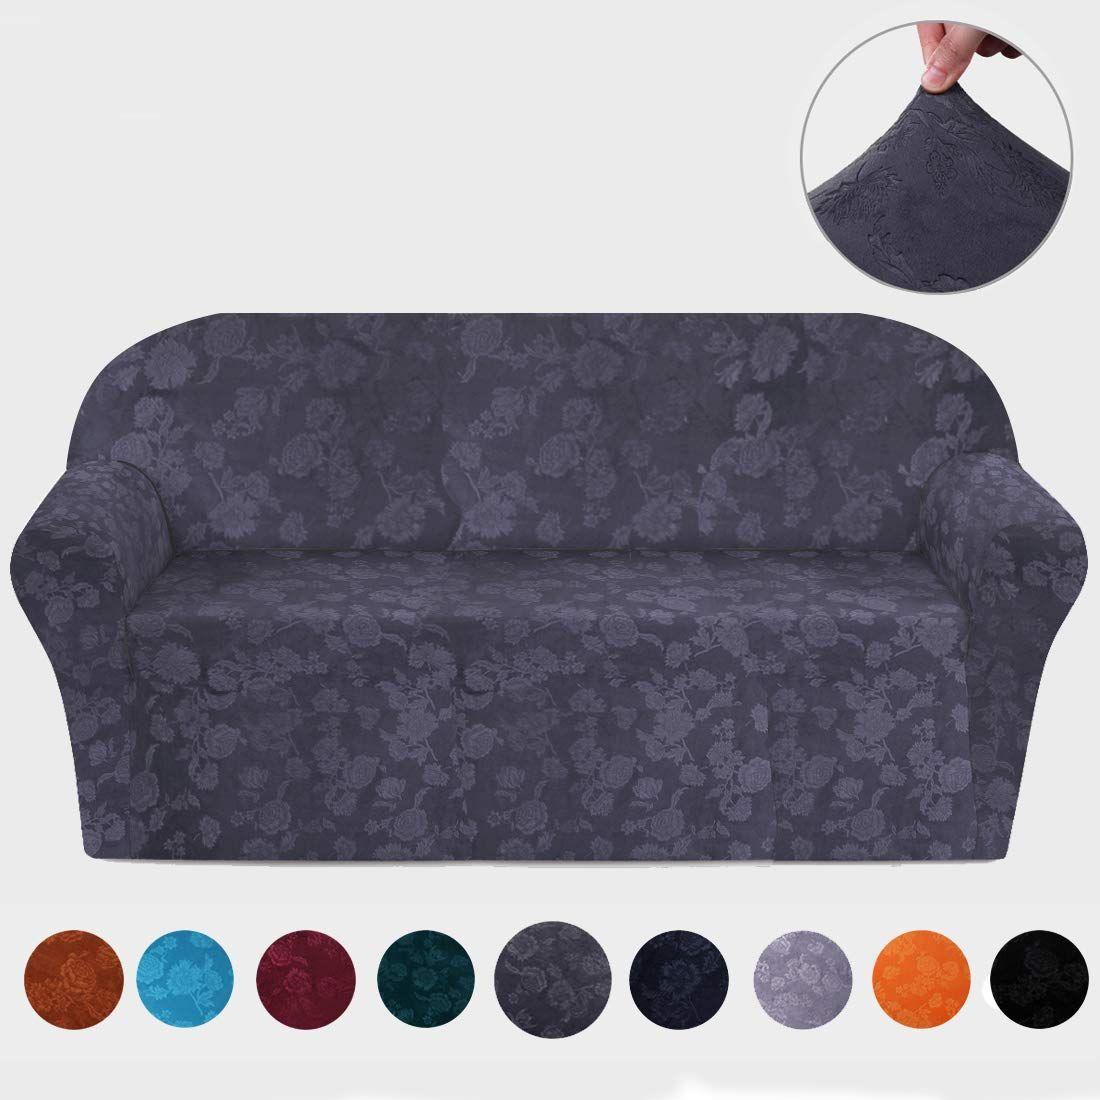 Amazon Com Misaya Stretch Sofa Cover Soft Non Slip Furniture Protector Velvet Embossing Flower 1 Piece Couc Slip Covers Couch Sofa Covers Furniture Protectors